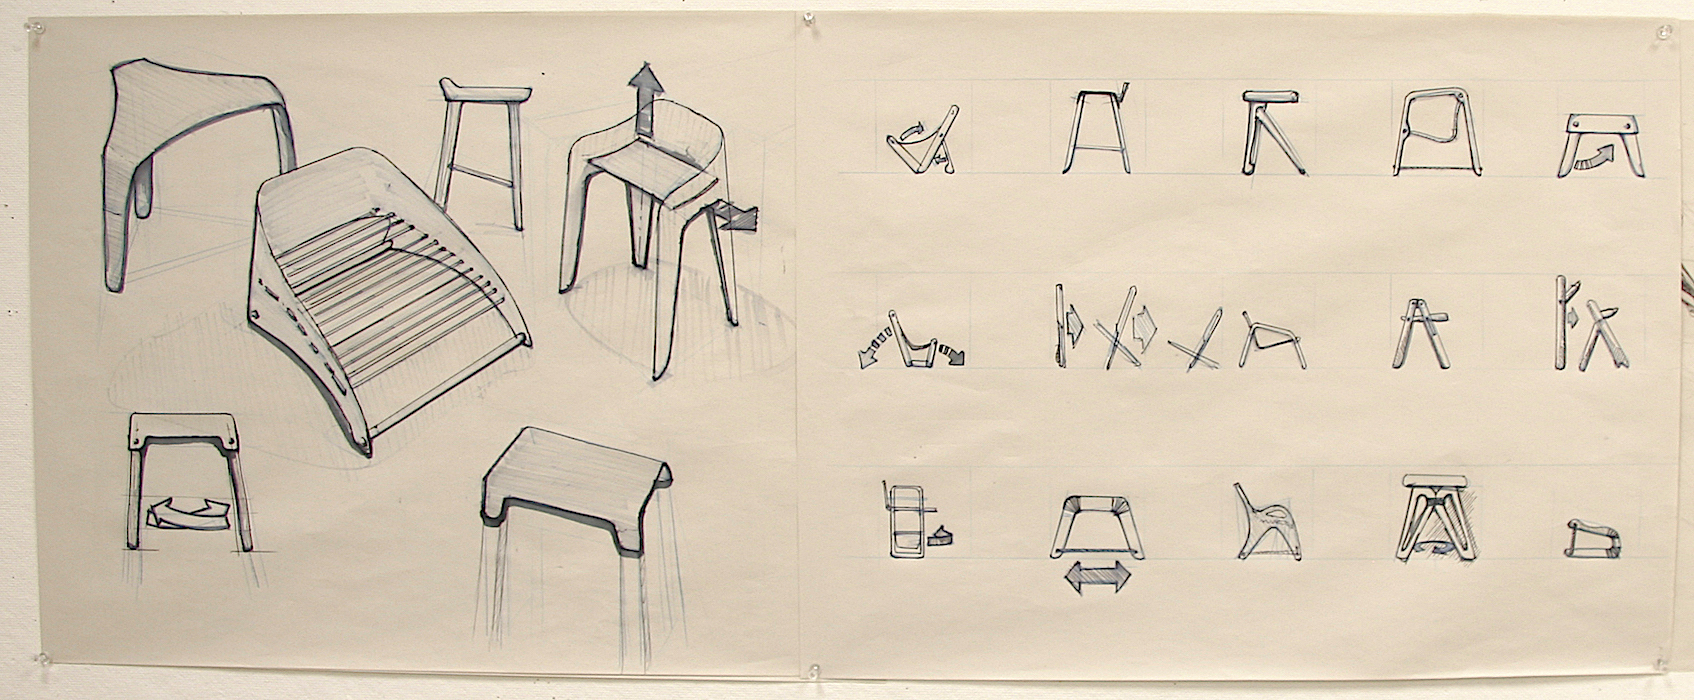 Brennan-Chiu_Industrial-Design_Chair-Project_Portable_Sketch_Concepts.jpg